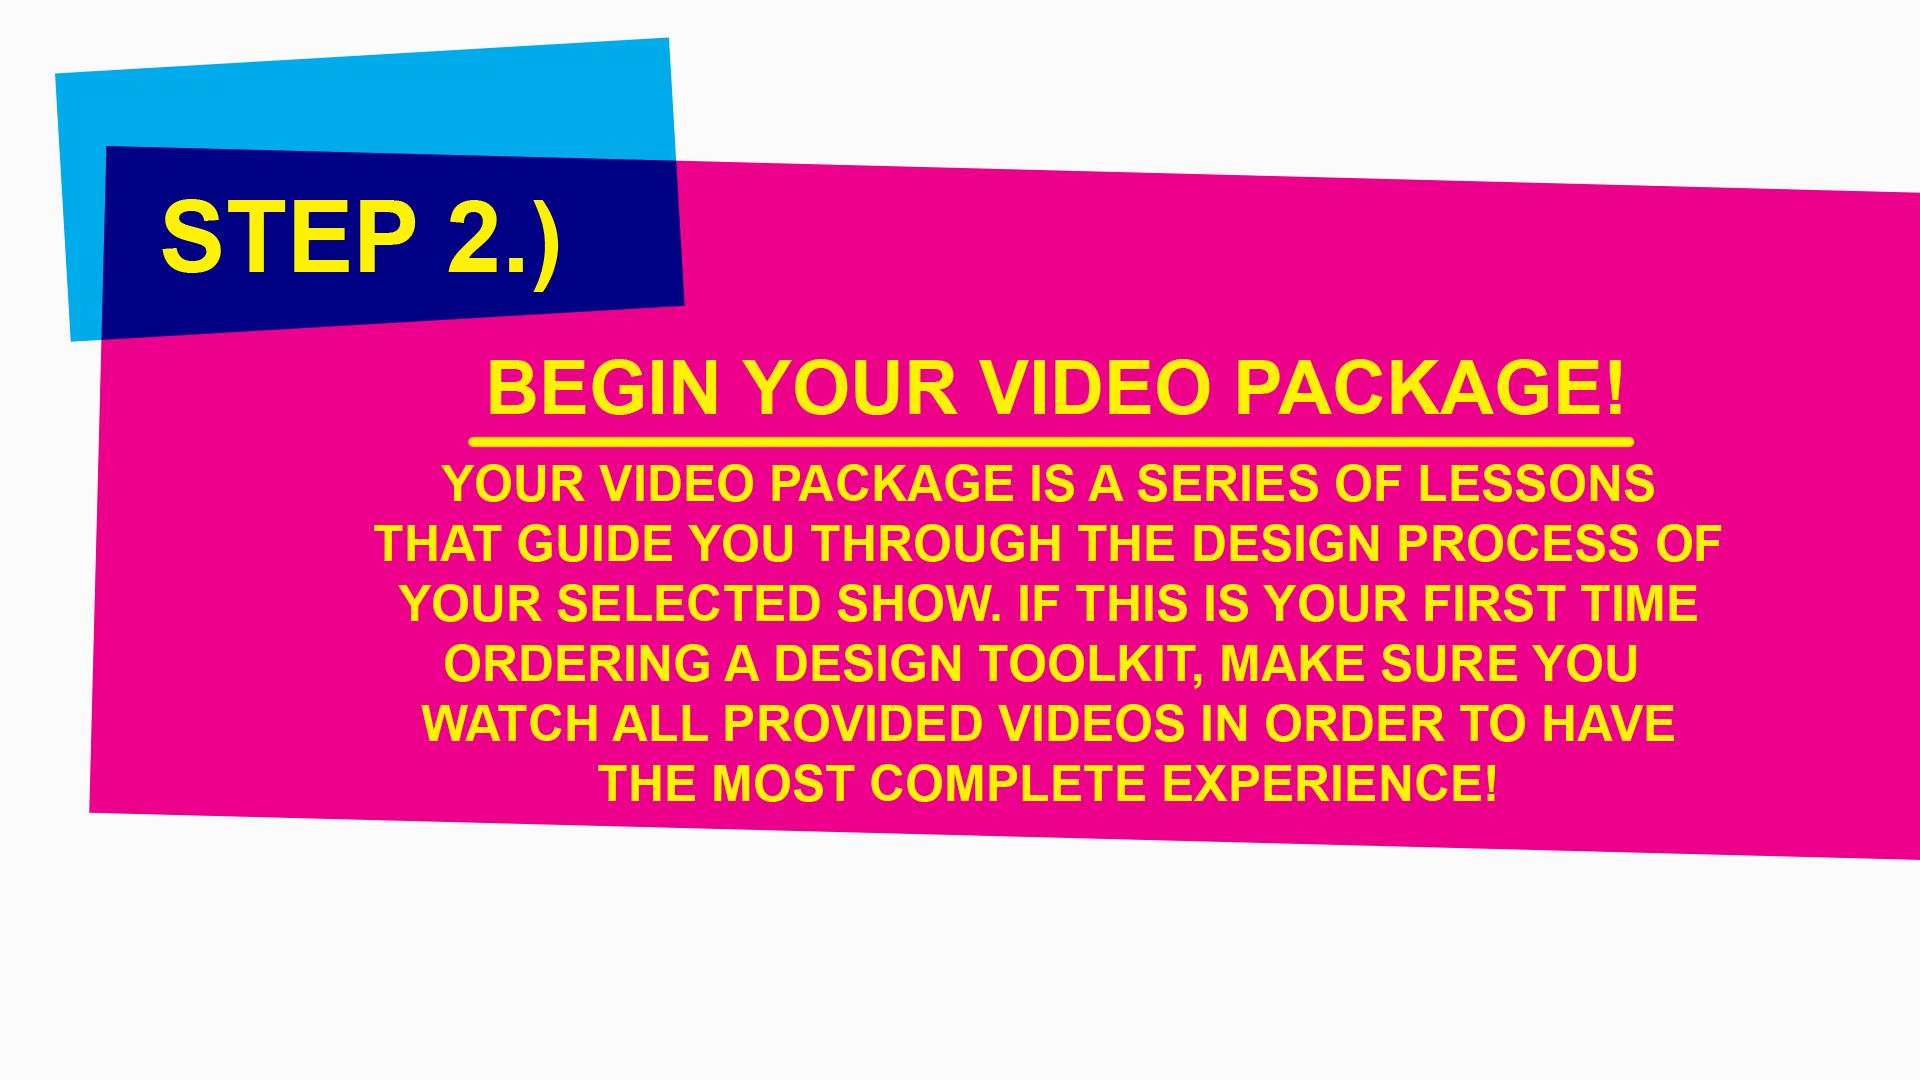 step 2 card.jpg